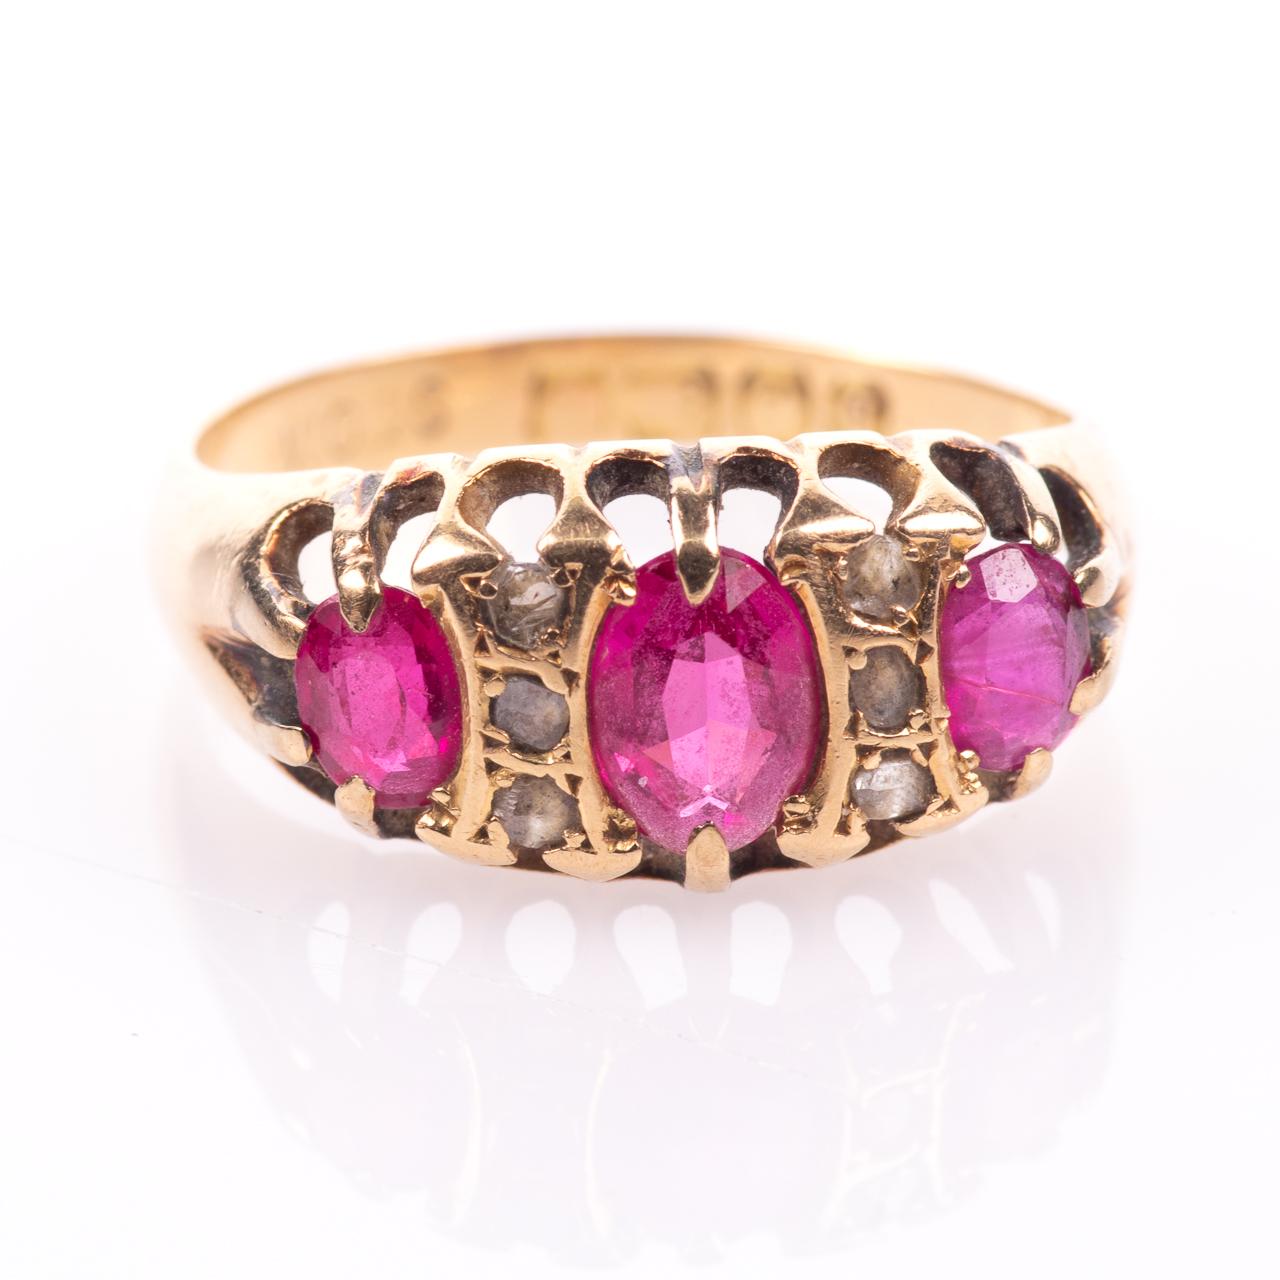 18ct Gold 1.20ct Ruby & Diamond Ring Birmingham 1915 - Image 3 of 7